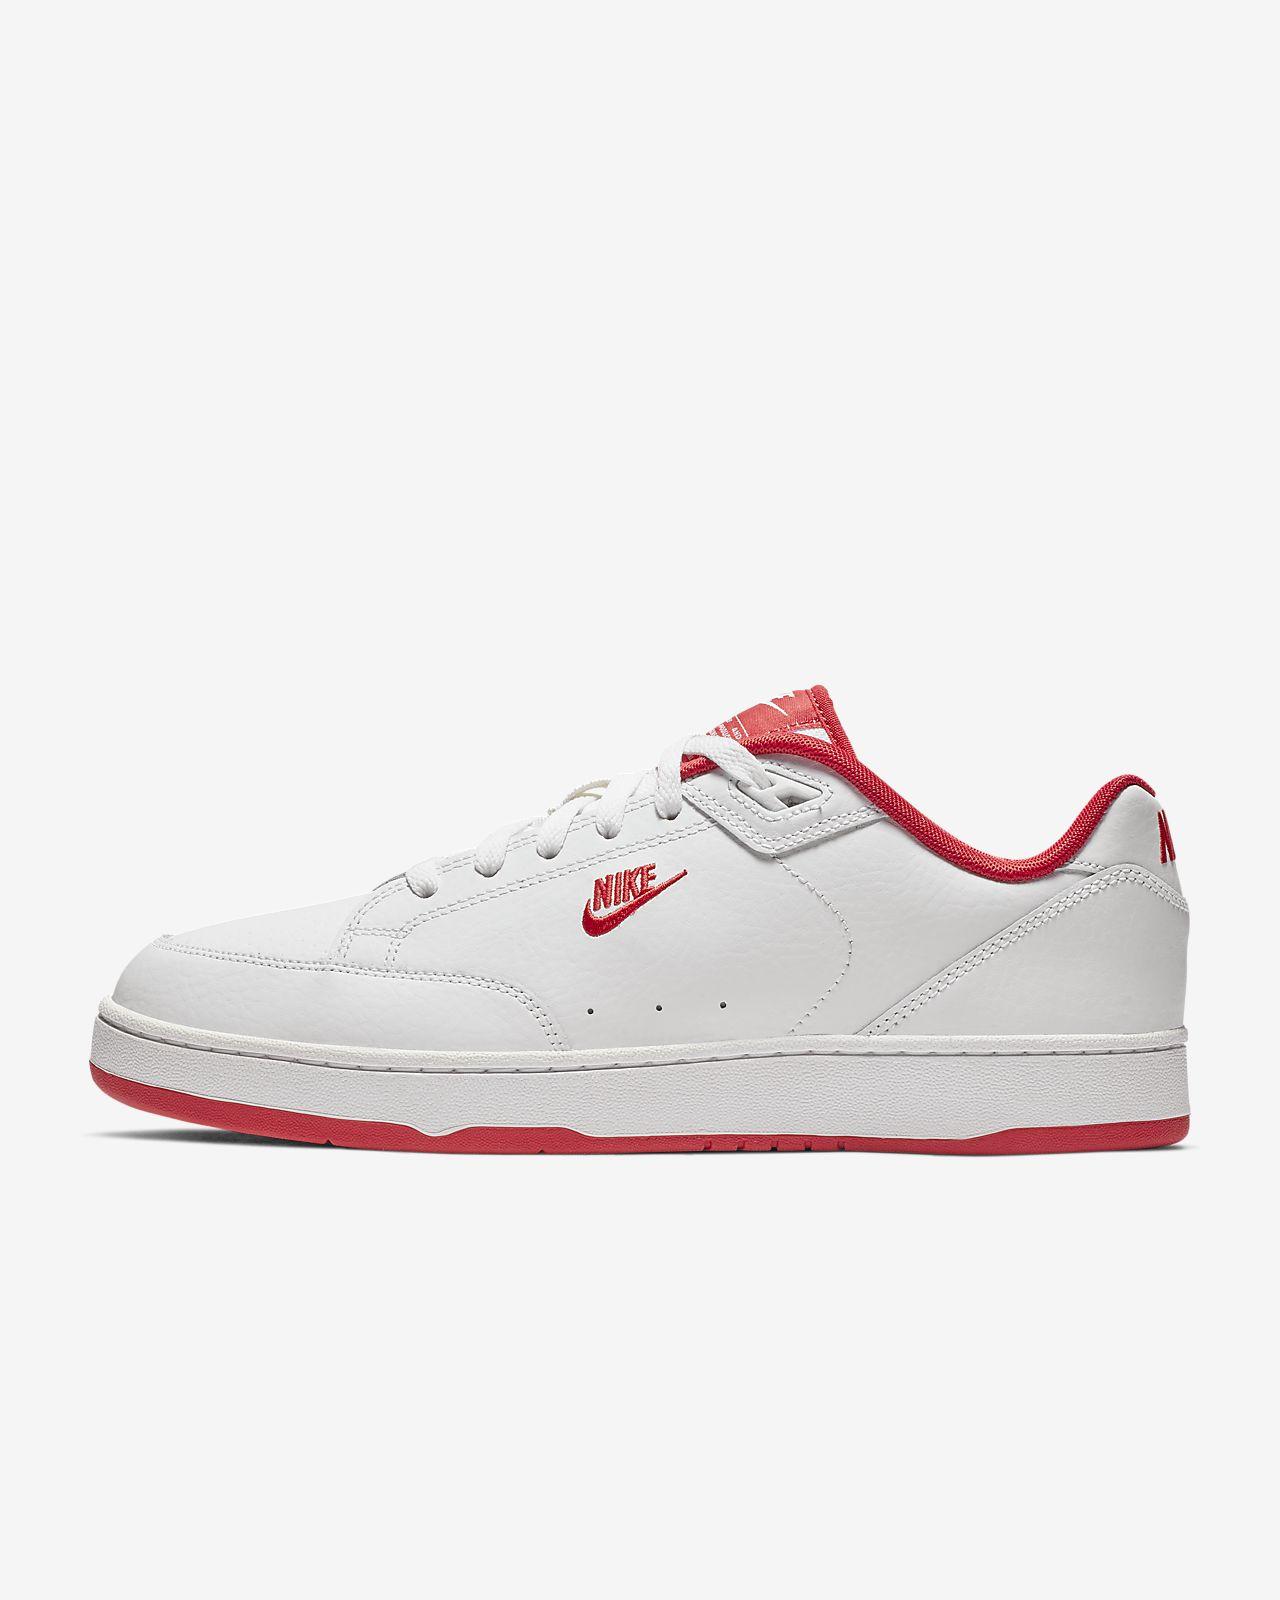 cheap for discount beea6 c8930 ... Scarpa Nike Grandstand II - Uomo